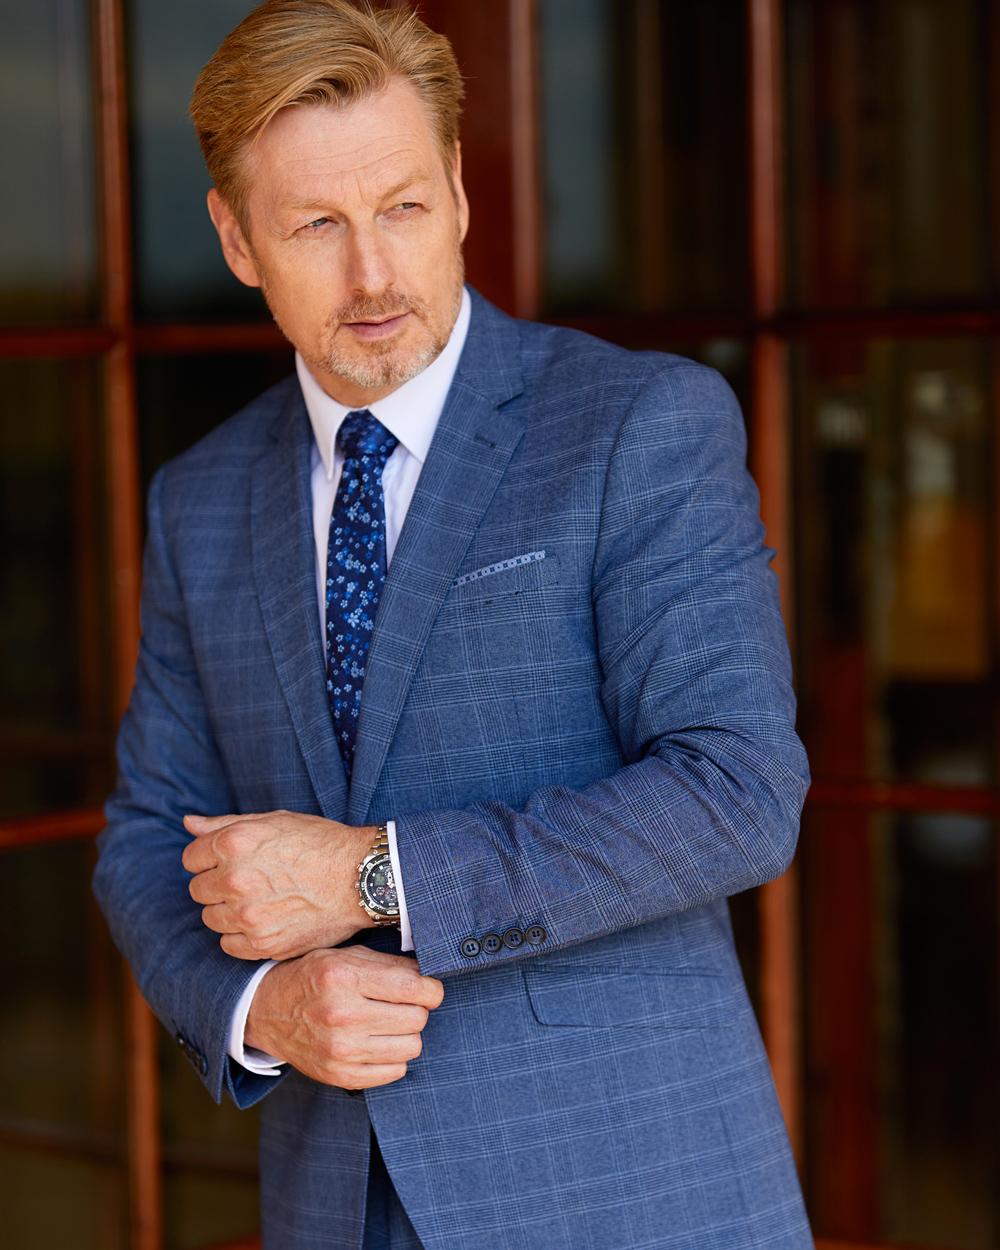 Man in smart blue suit